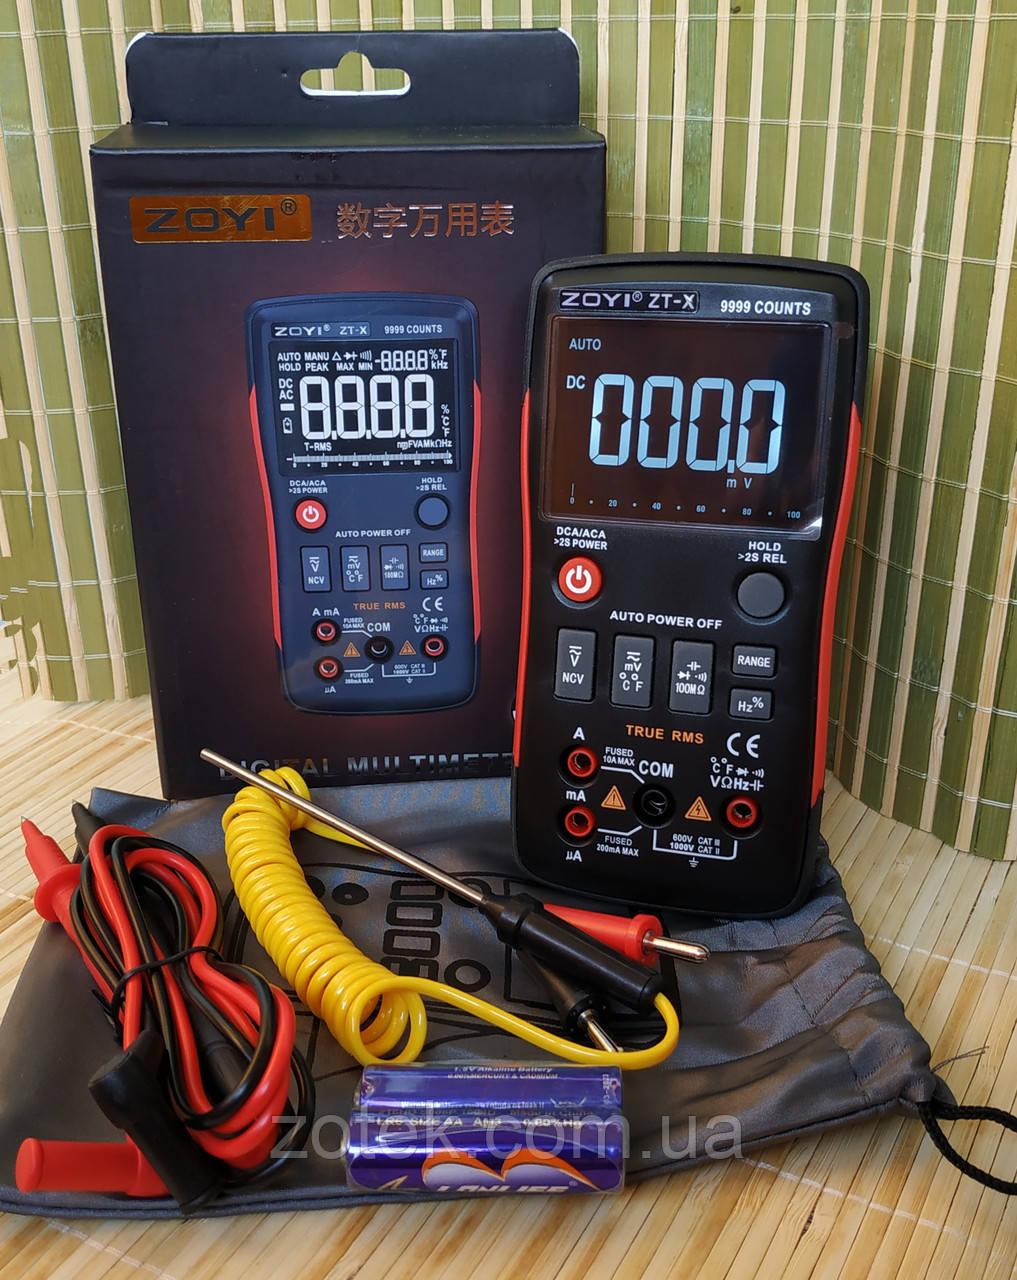 Защищённый мультиметр ZOYI ZT-X RM409b 9999 отсчётов ZOTEK  ( Richmeters RM409b , ANENG Q1 ) тестер вольтметр